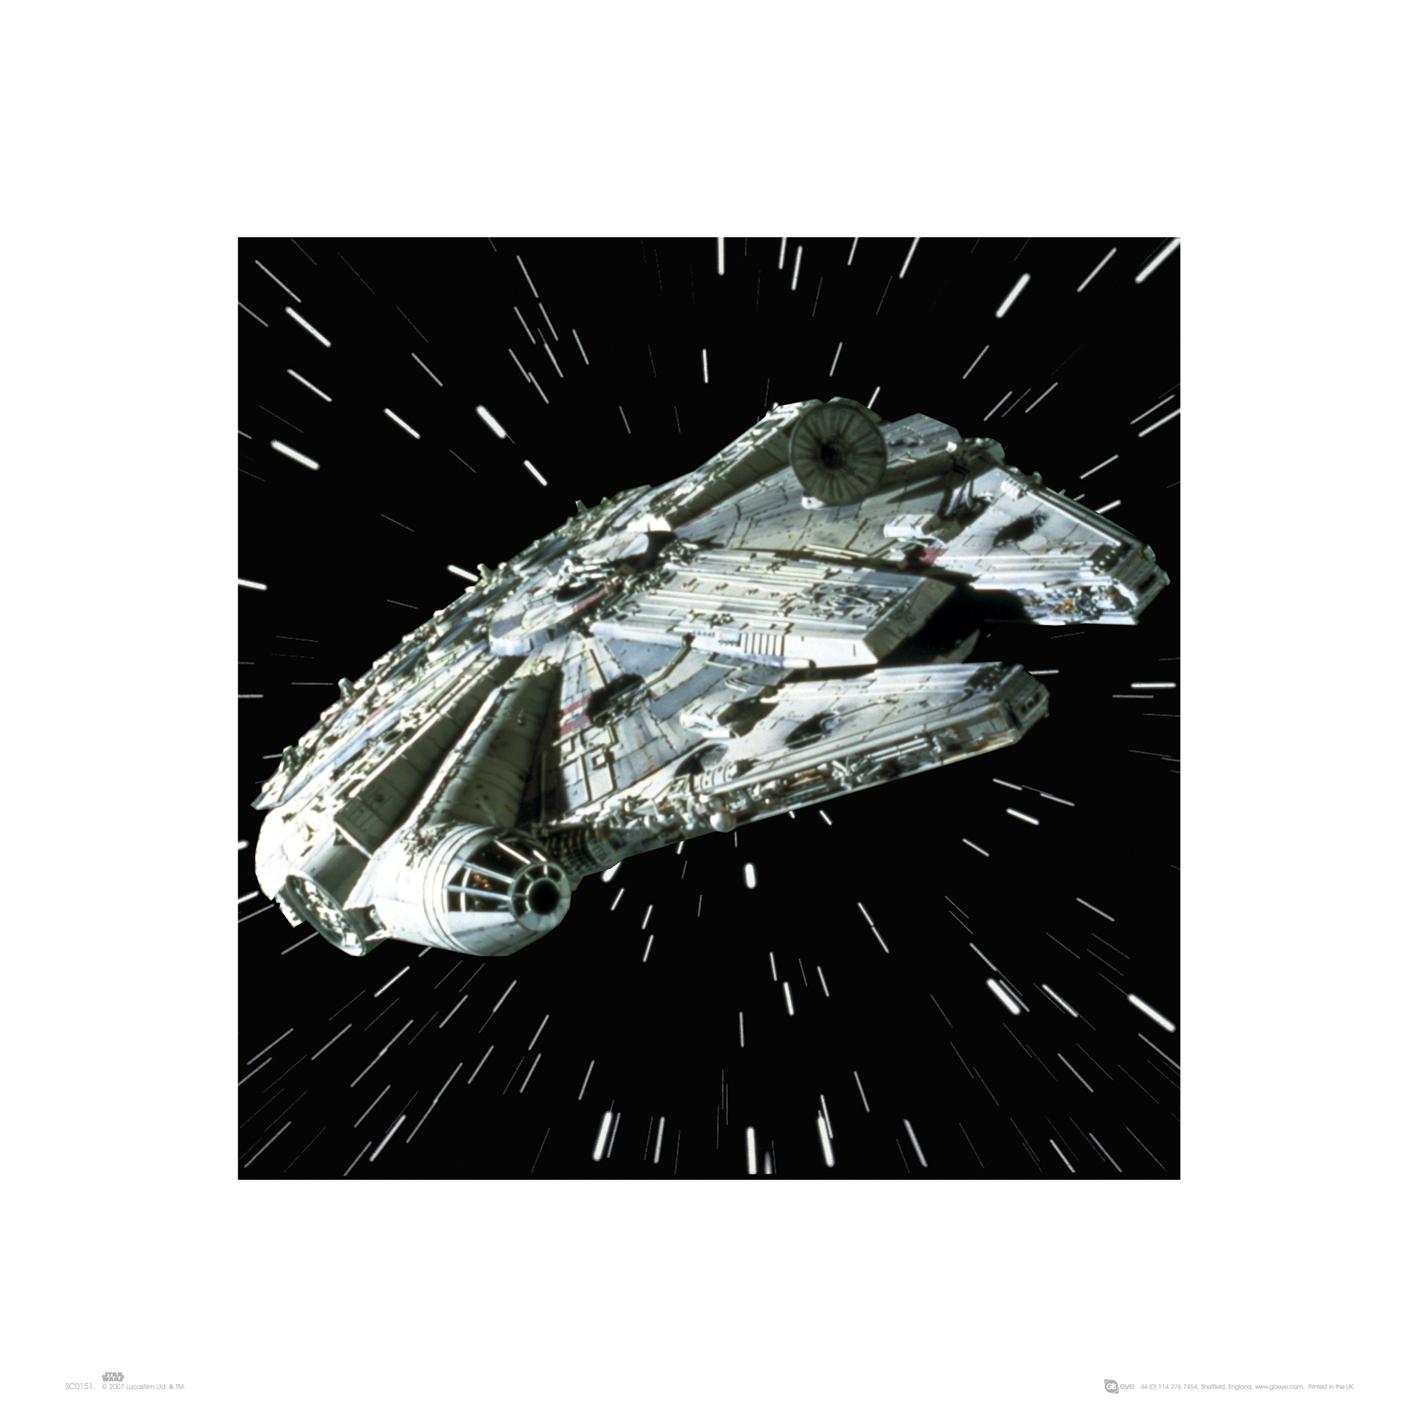 star wars millennium falcon kunstdruck 40x40. Black Bedroom Furniture Sets. Home Design Ideas